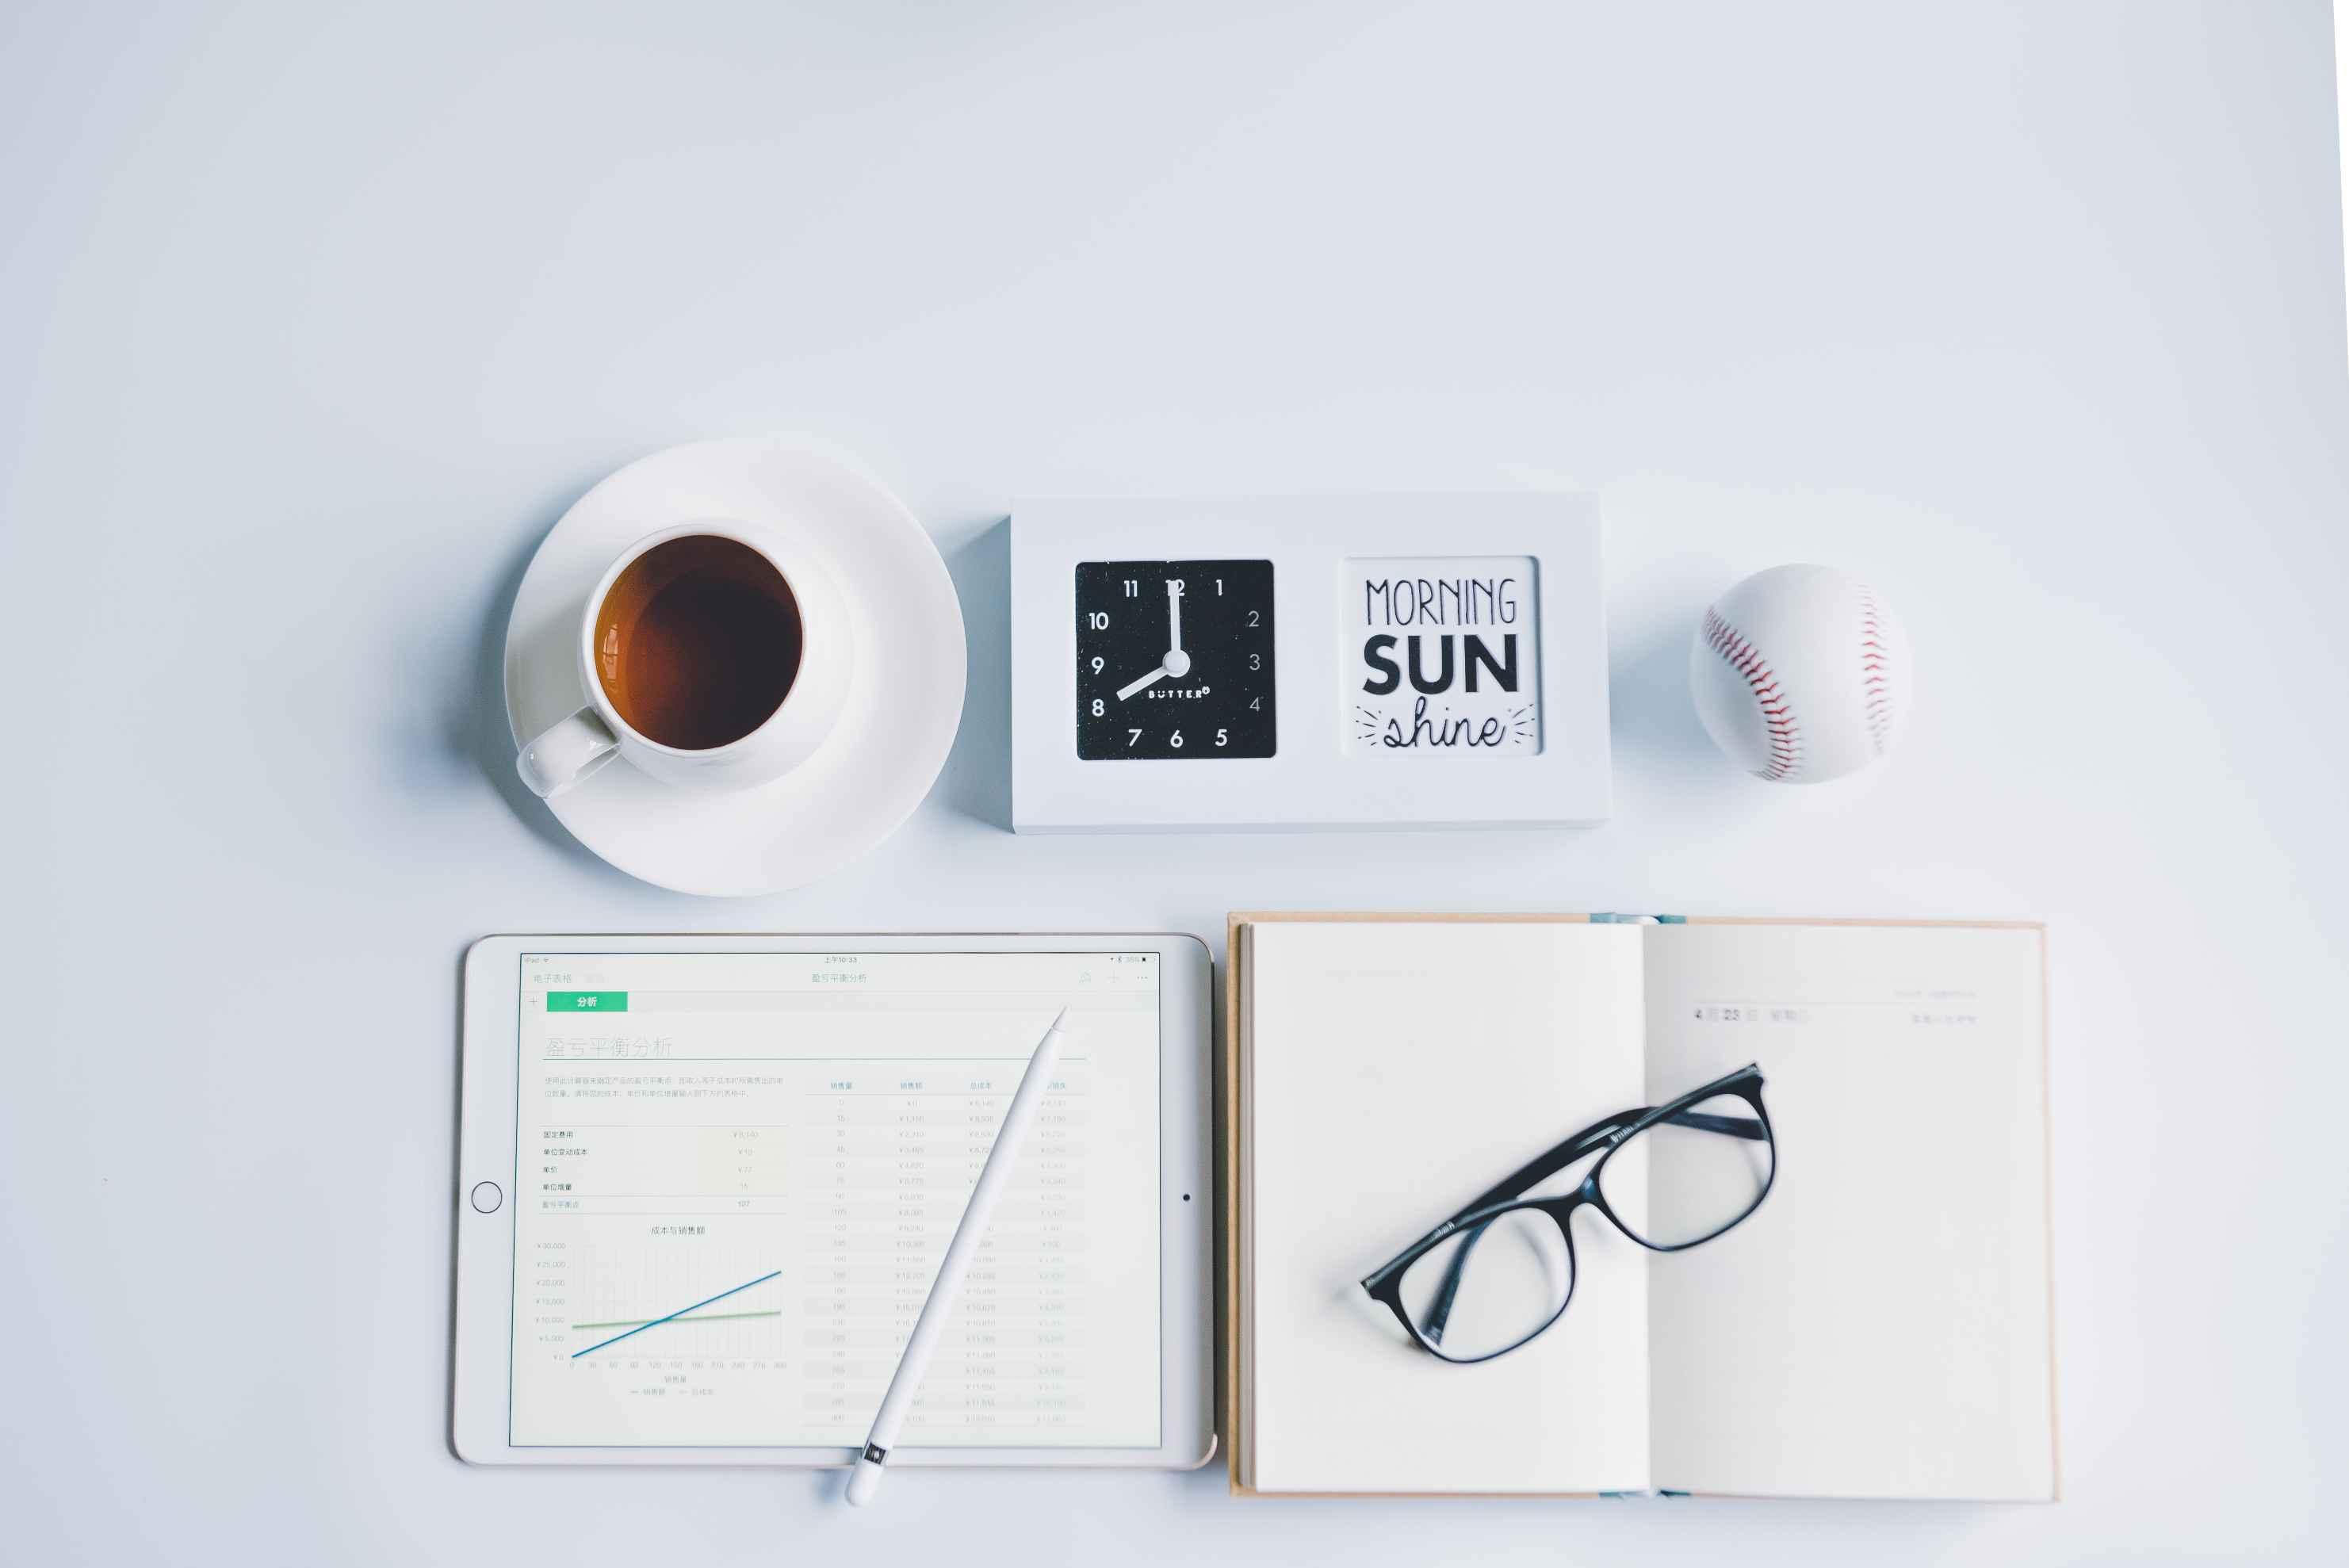 Web前端进阶要学什么?Web前端开发四大必备核心技能分享